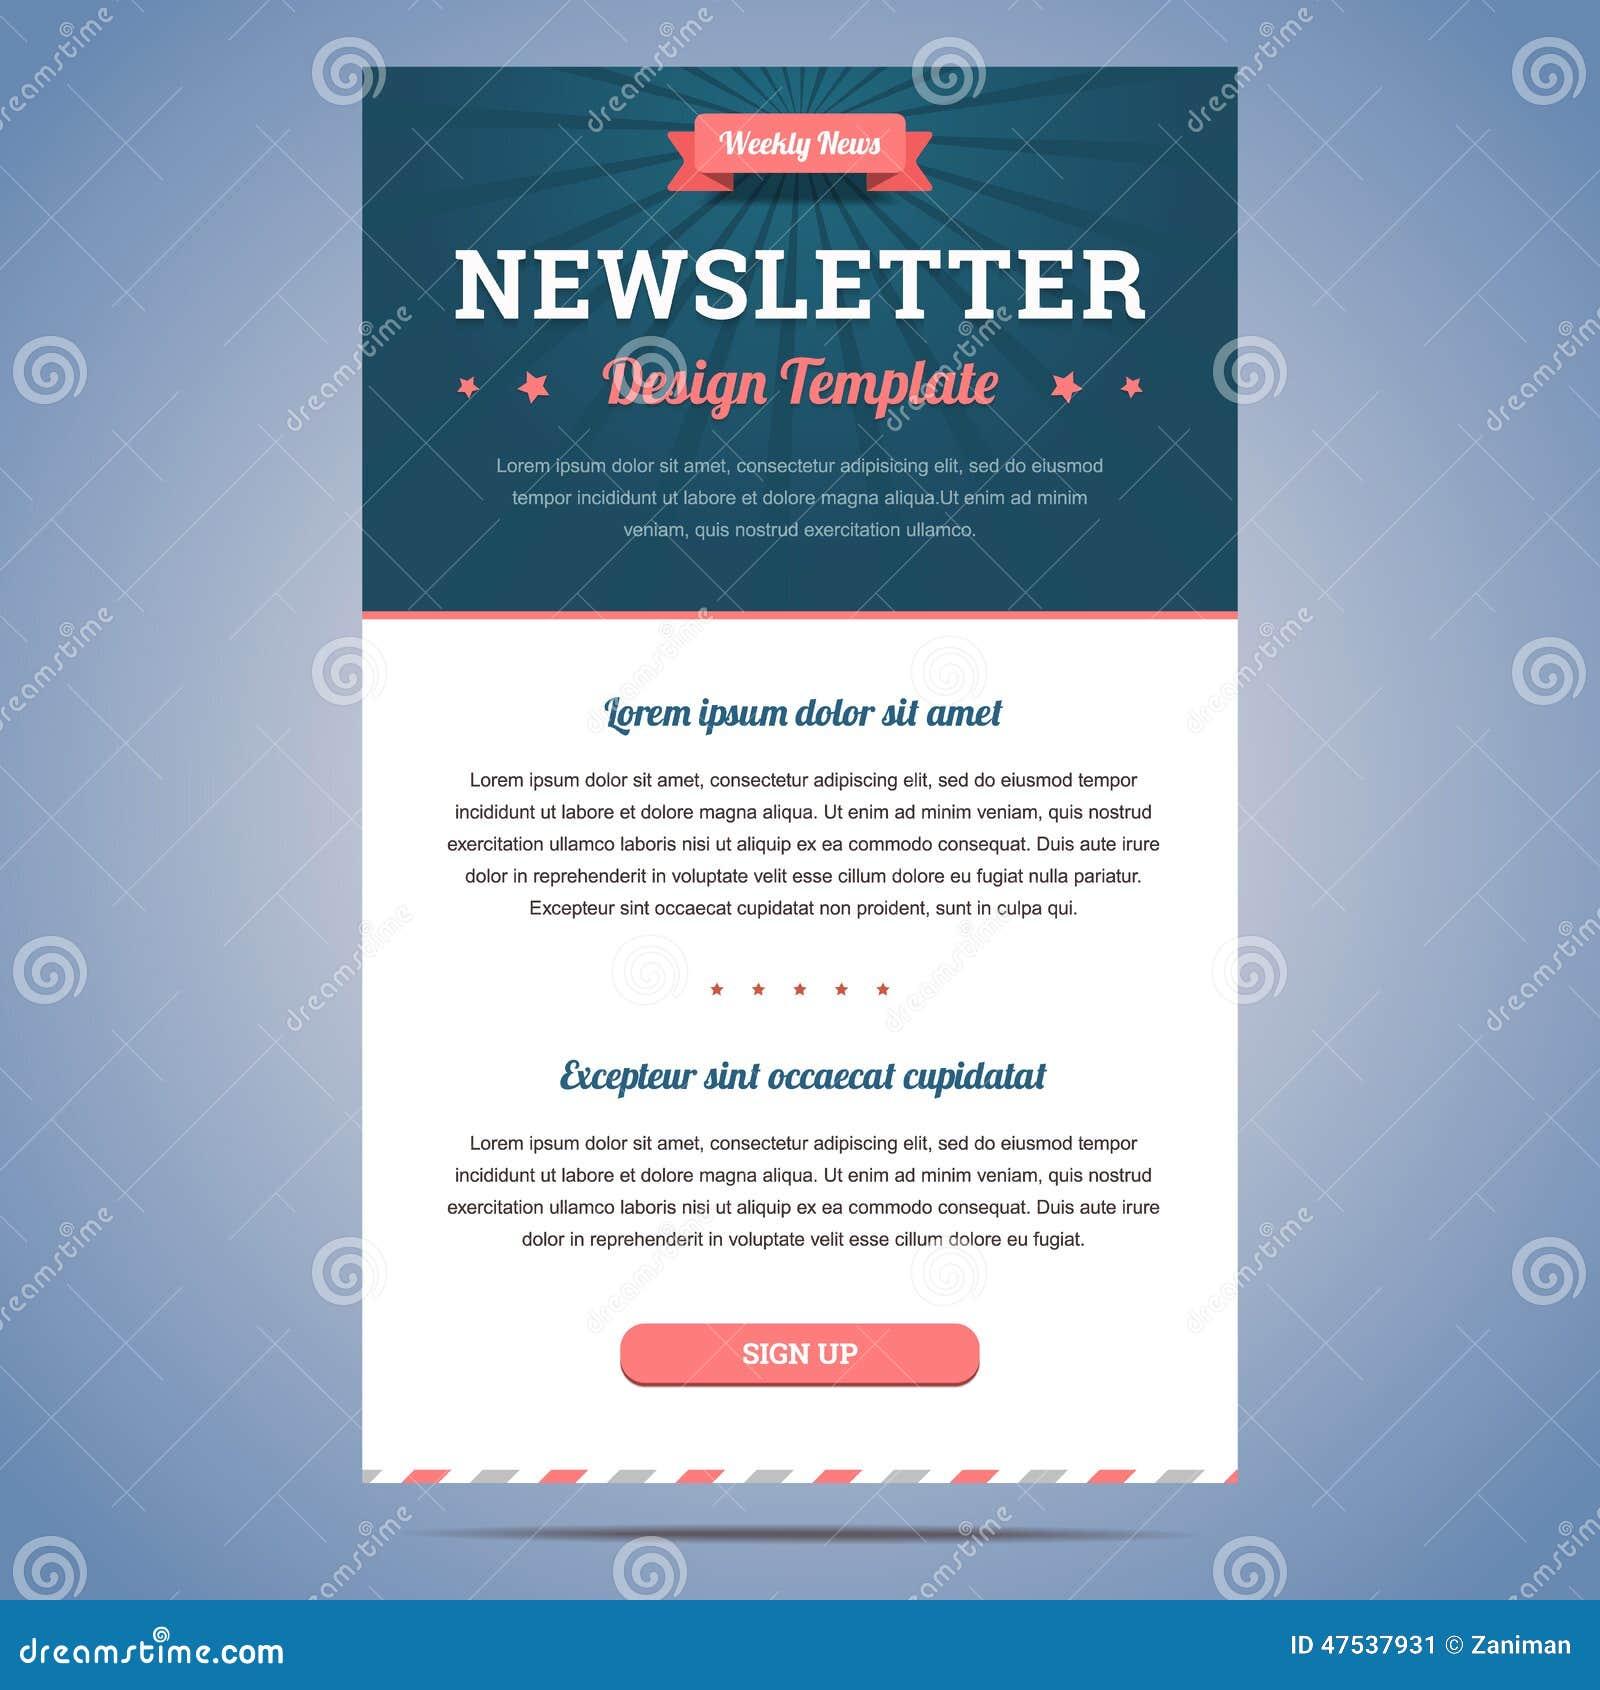 Newsletter Design Template Stock Vector Image 47537931